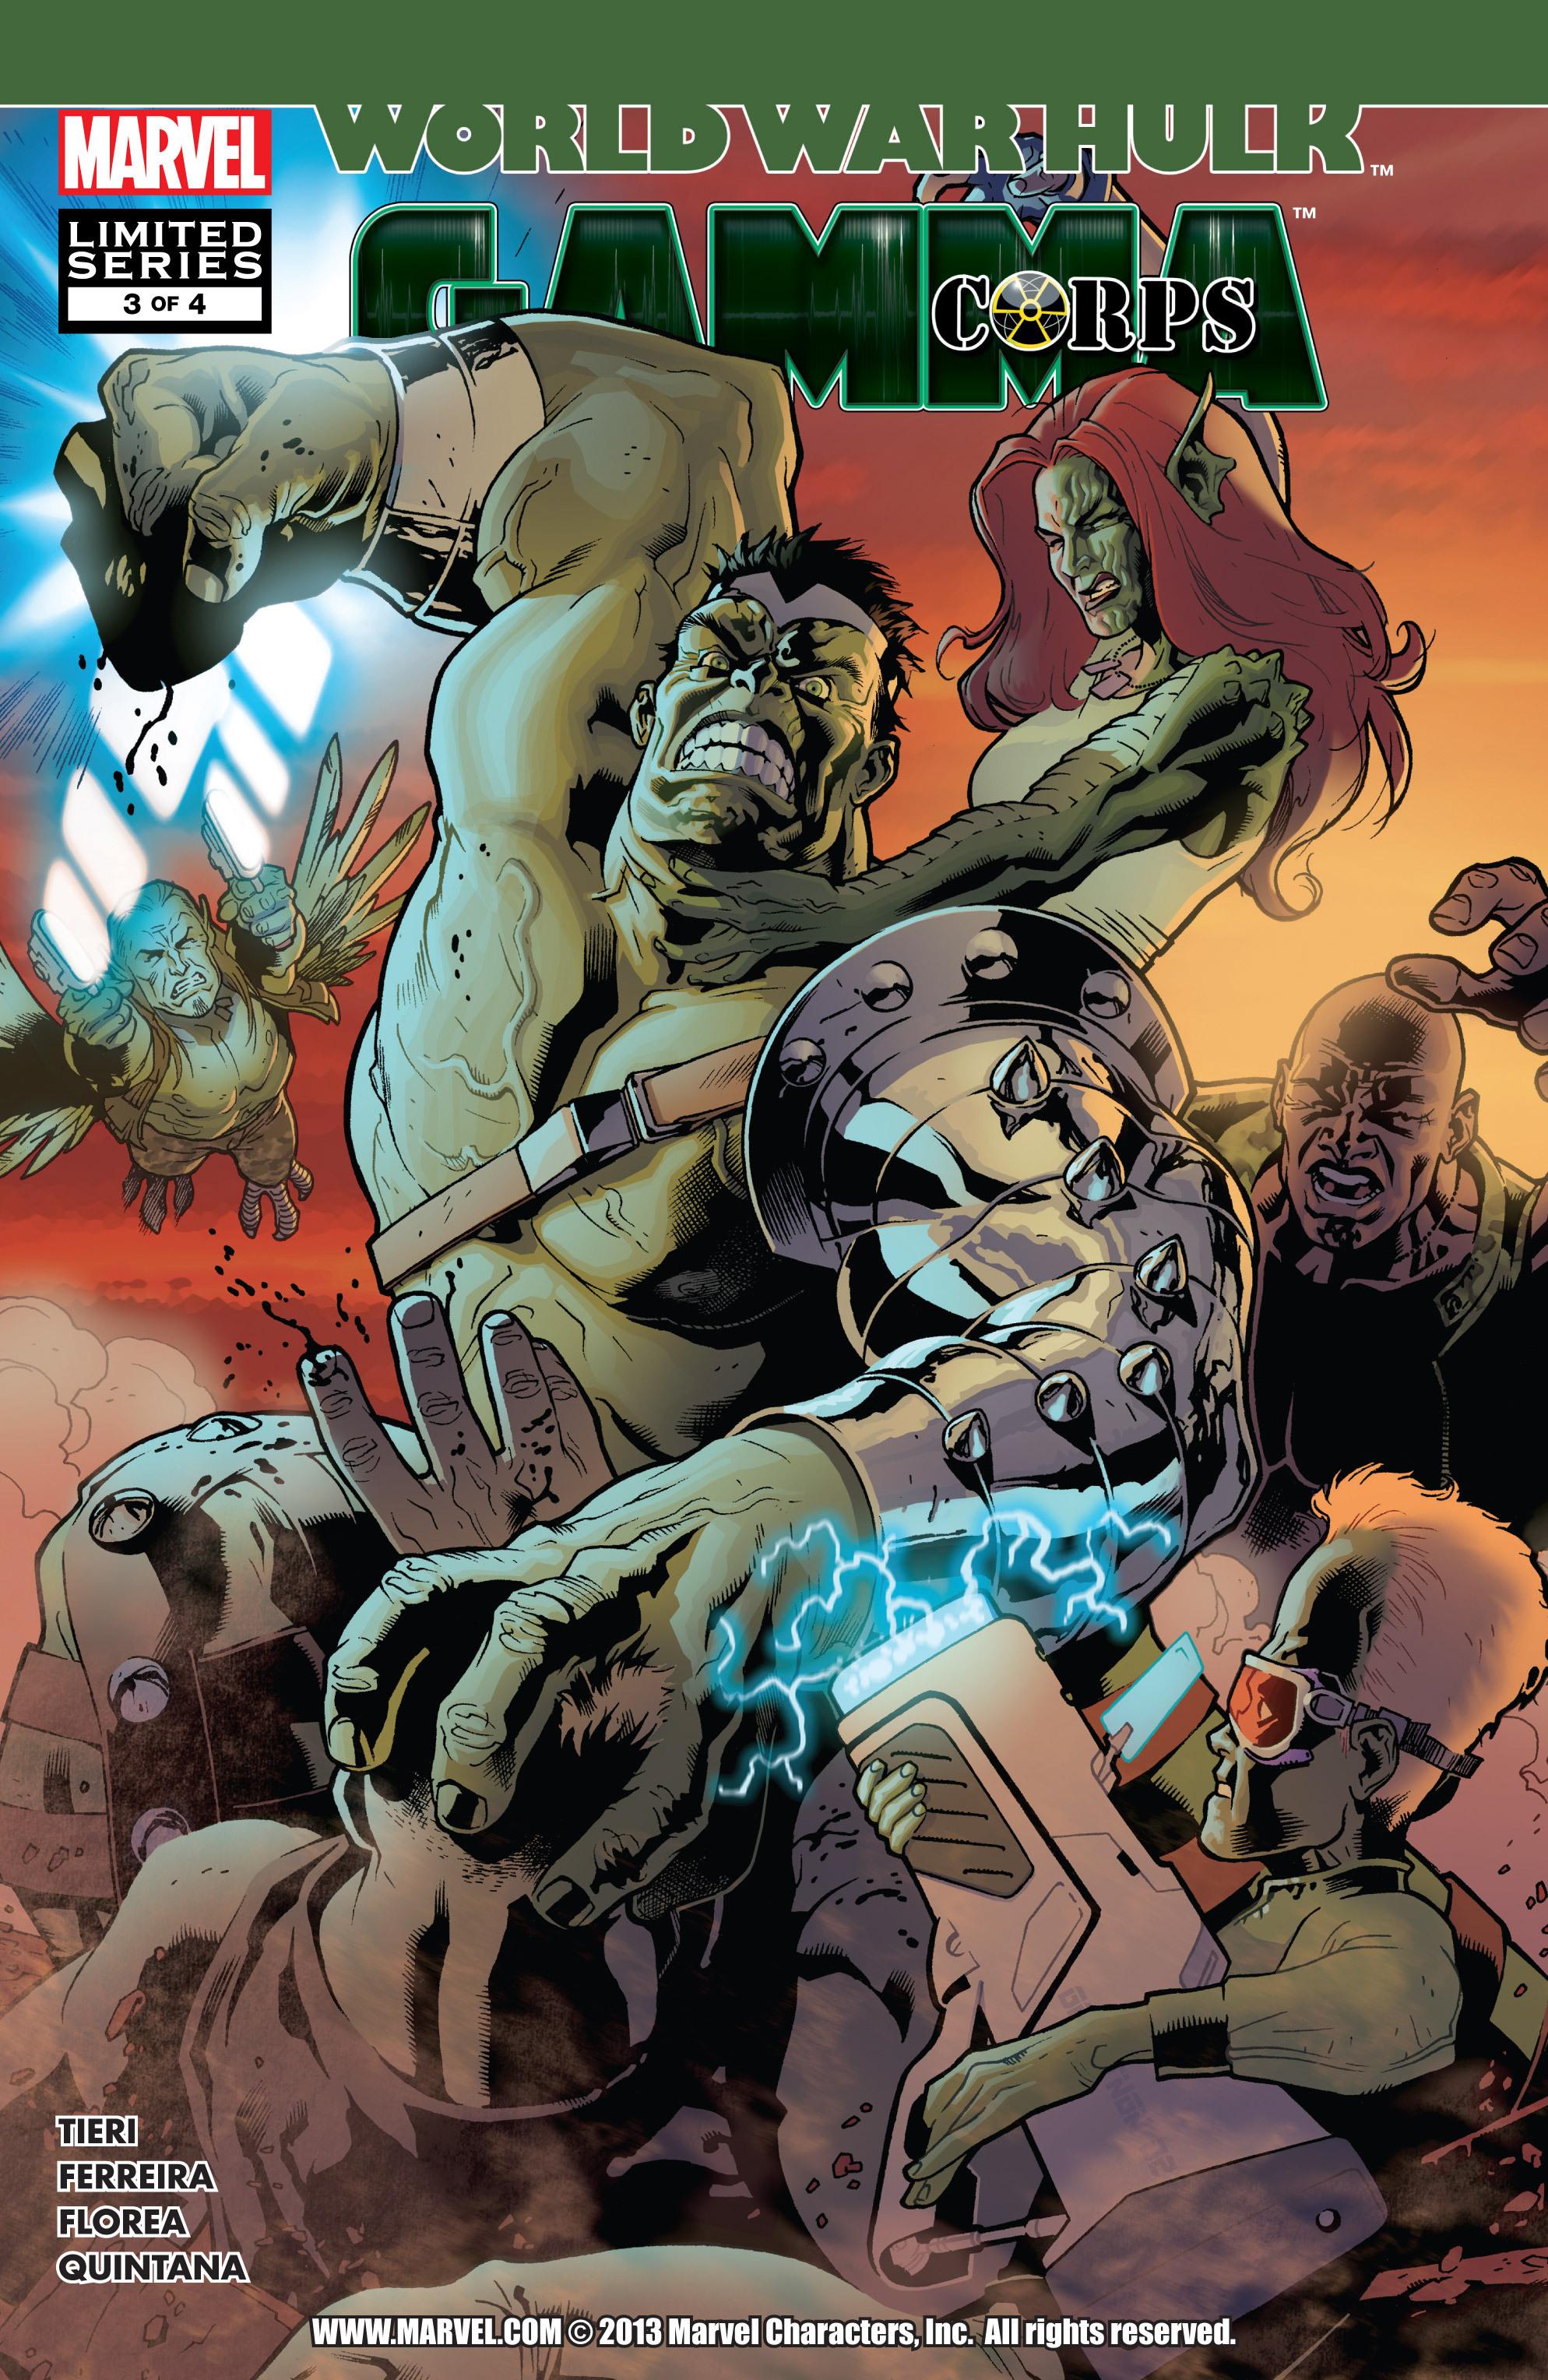 Read online World War Hulk: Gamma Corps comic -  Issue #3 - 1